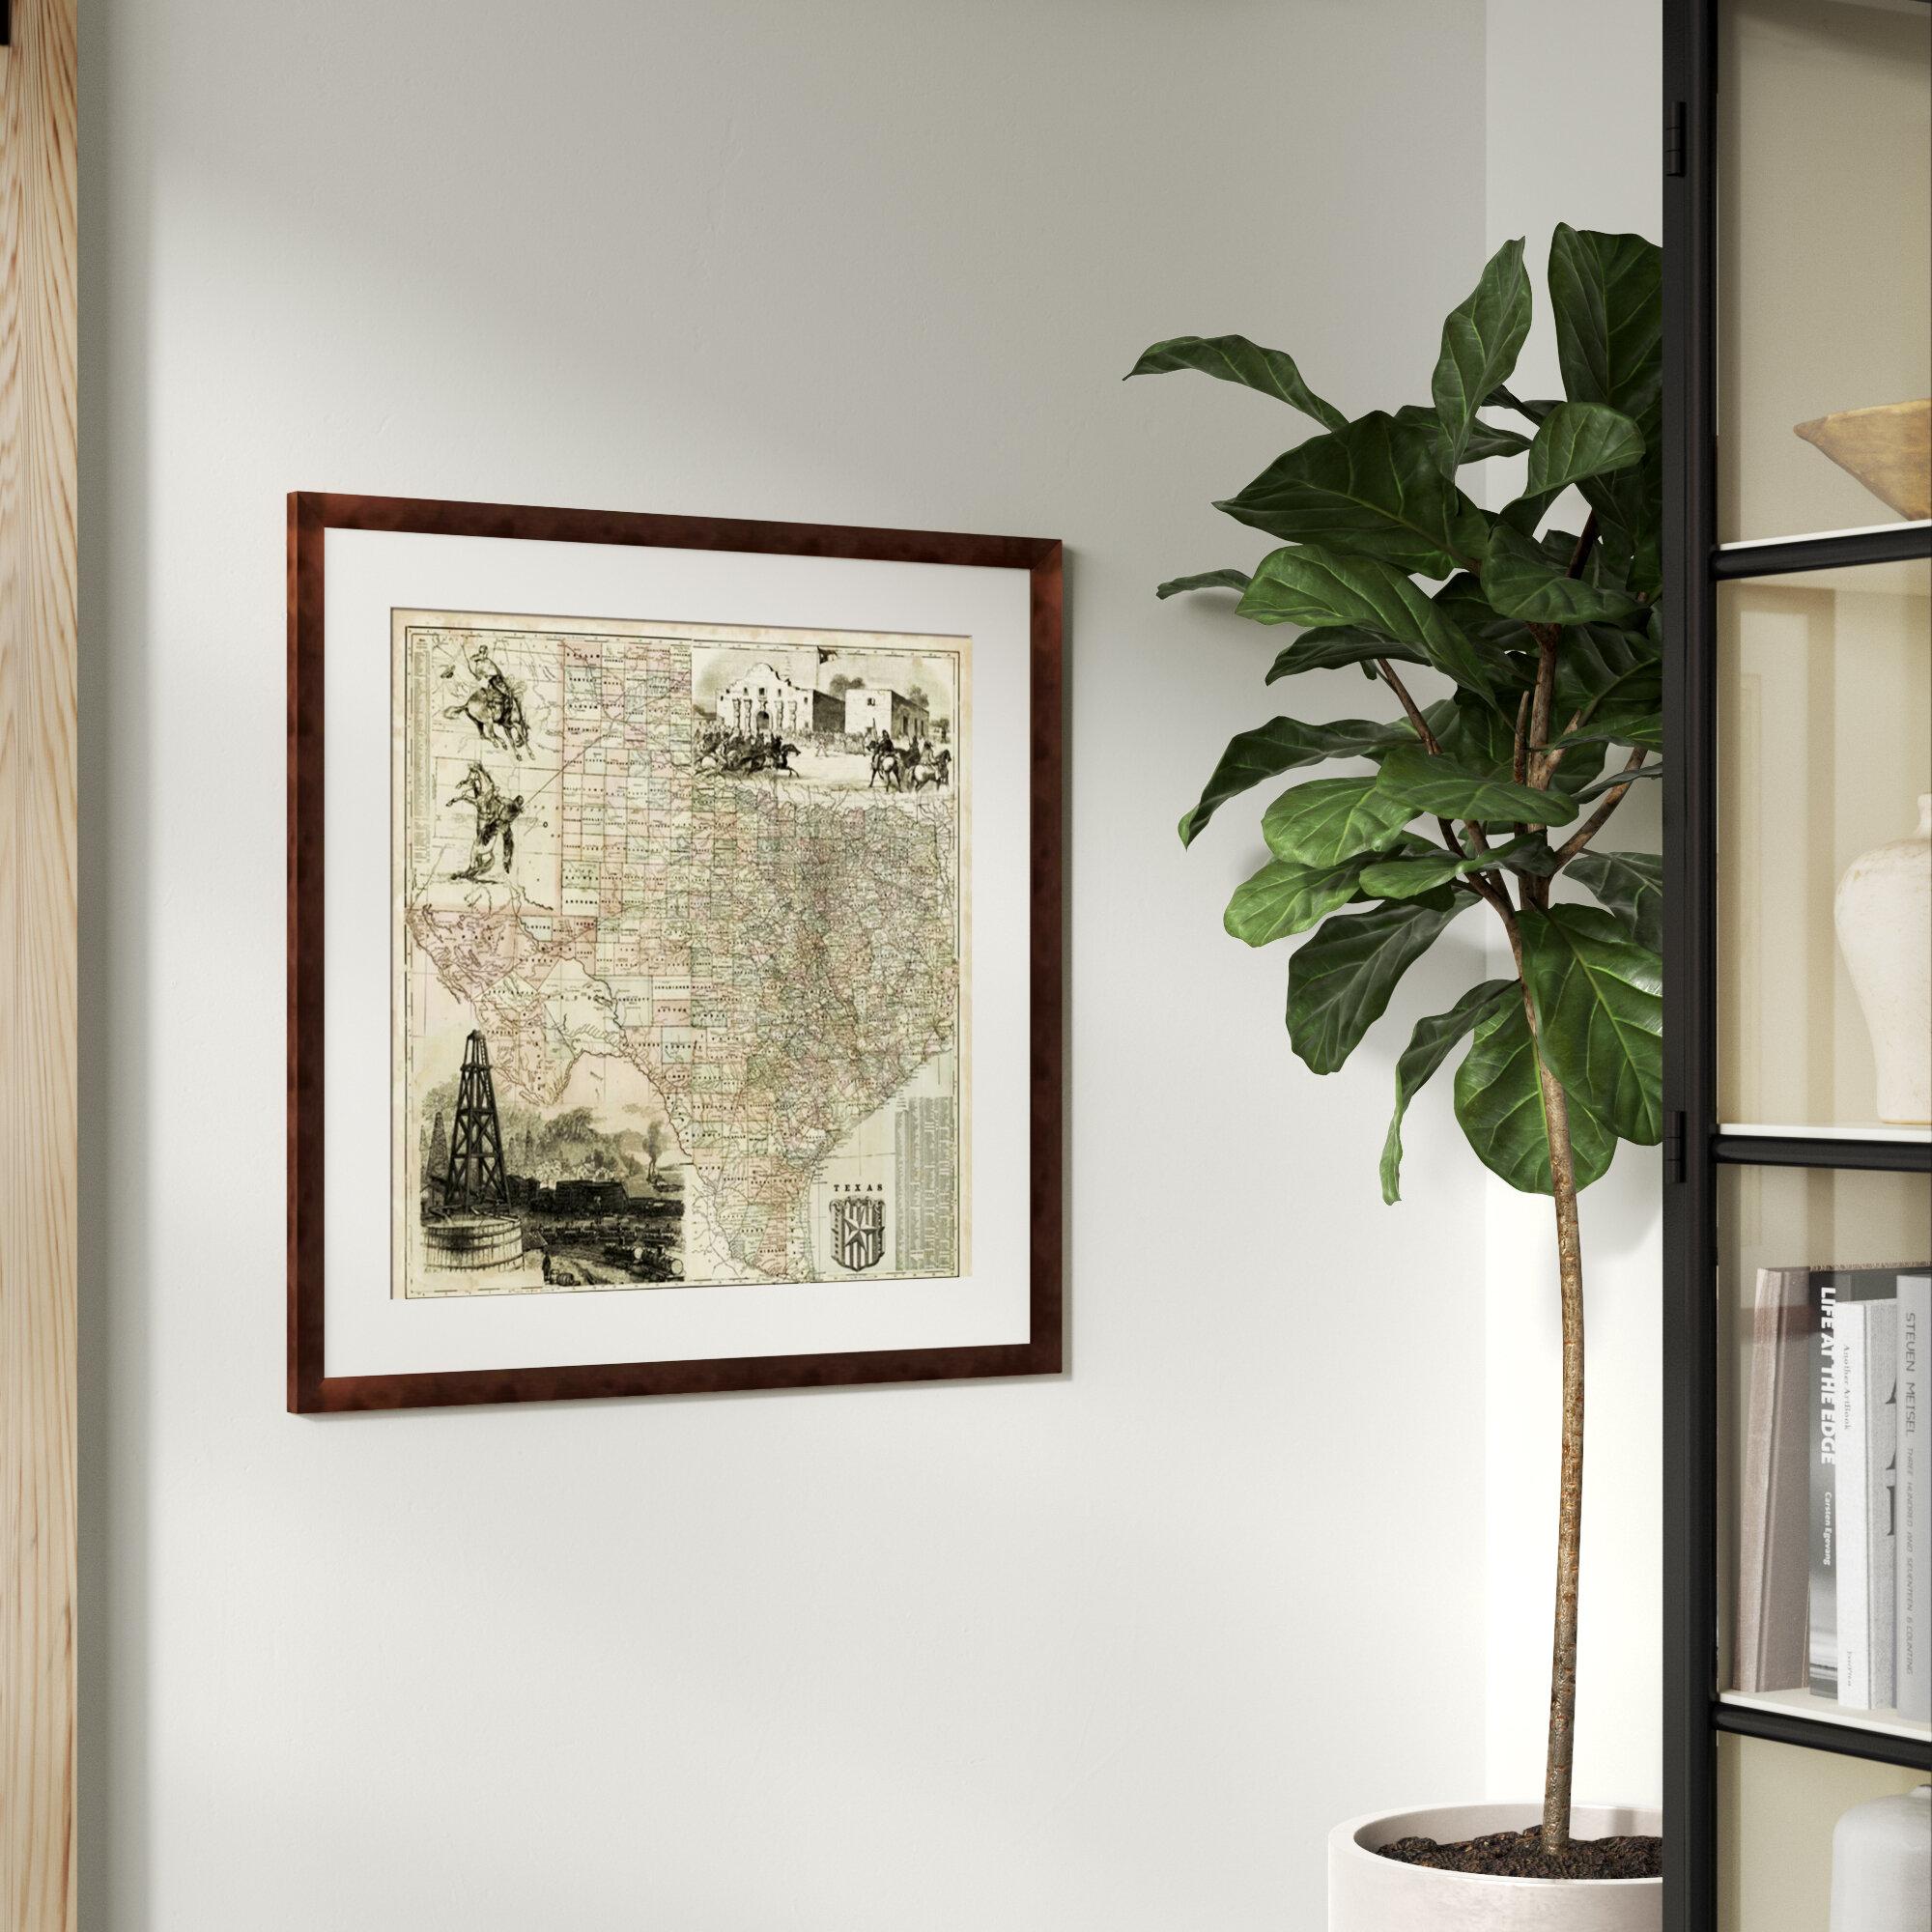 Greyleigh \'Map of Texas\' Framed Graphic Art Print   Wayfair